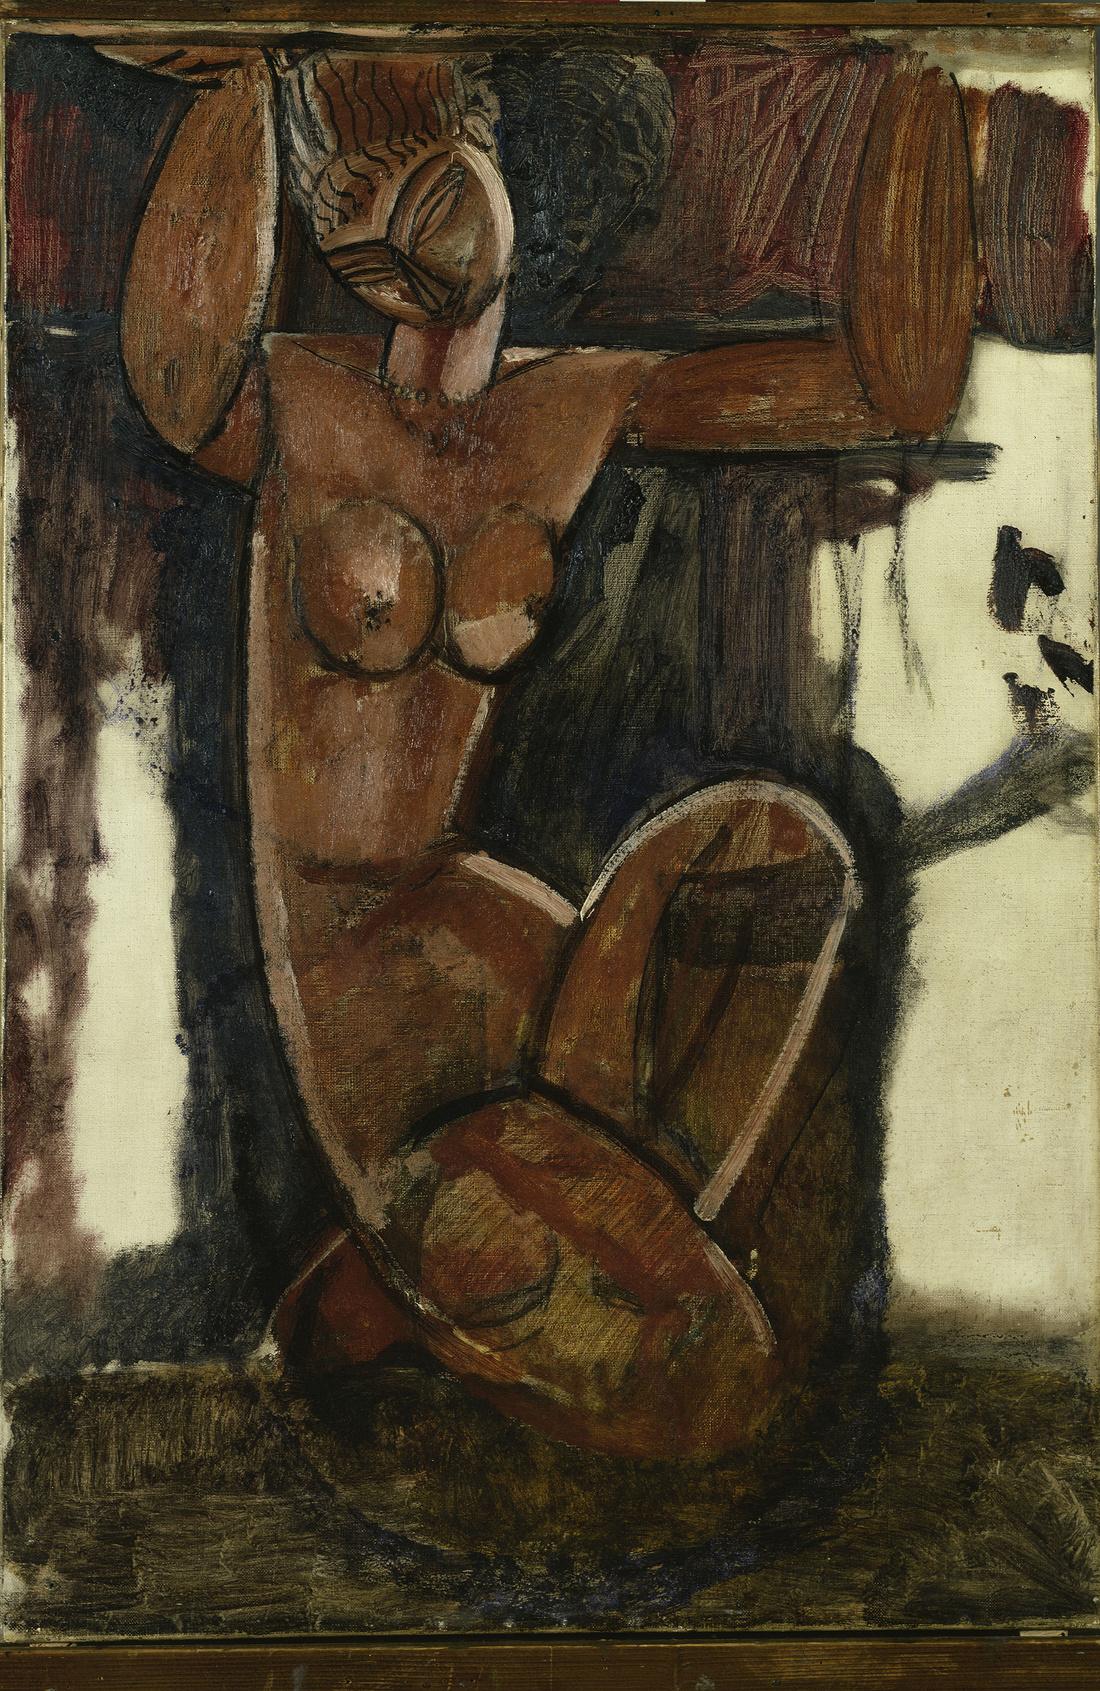 Amedeo Modigliani, Caryatid, c. 1911. Kunstsammlung Nordrhein-Westfalen, Dusseldorf. Courtesy of the Jewish Museum.